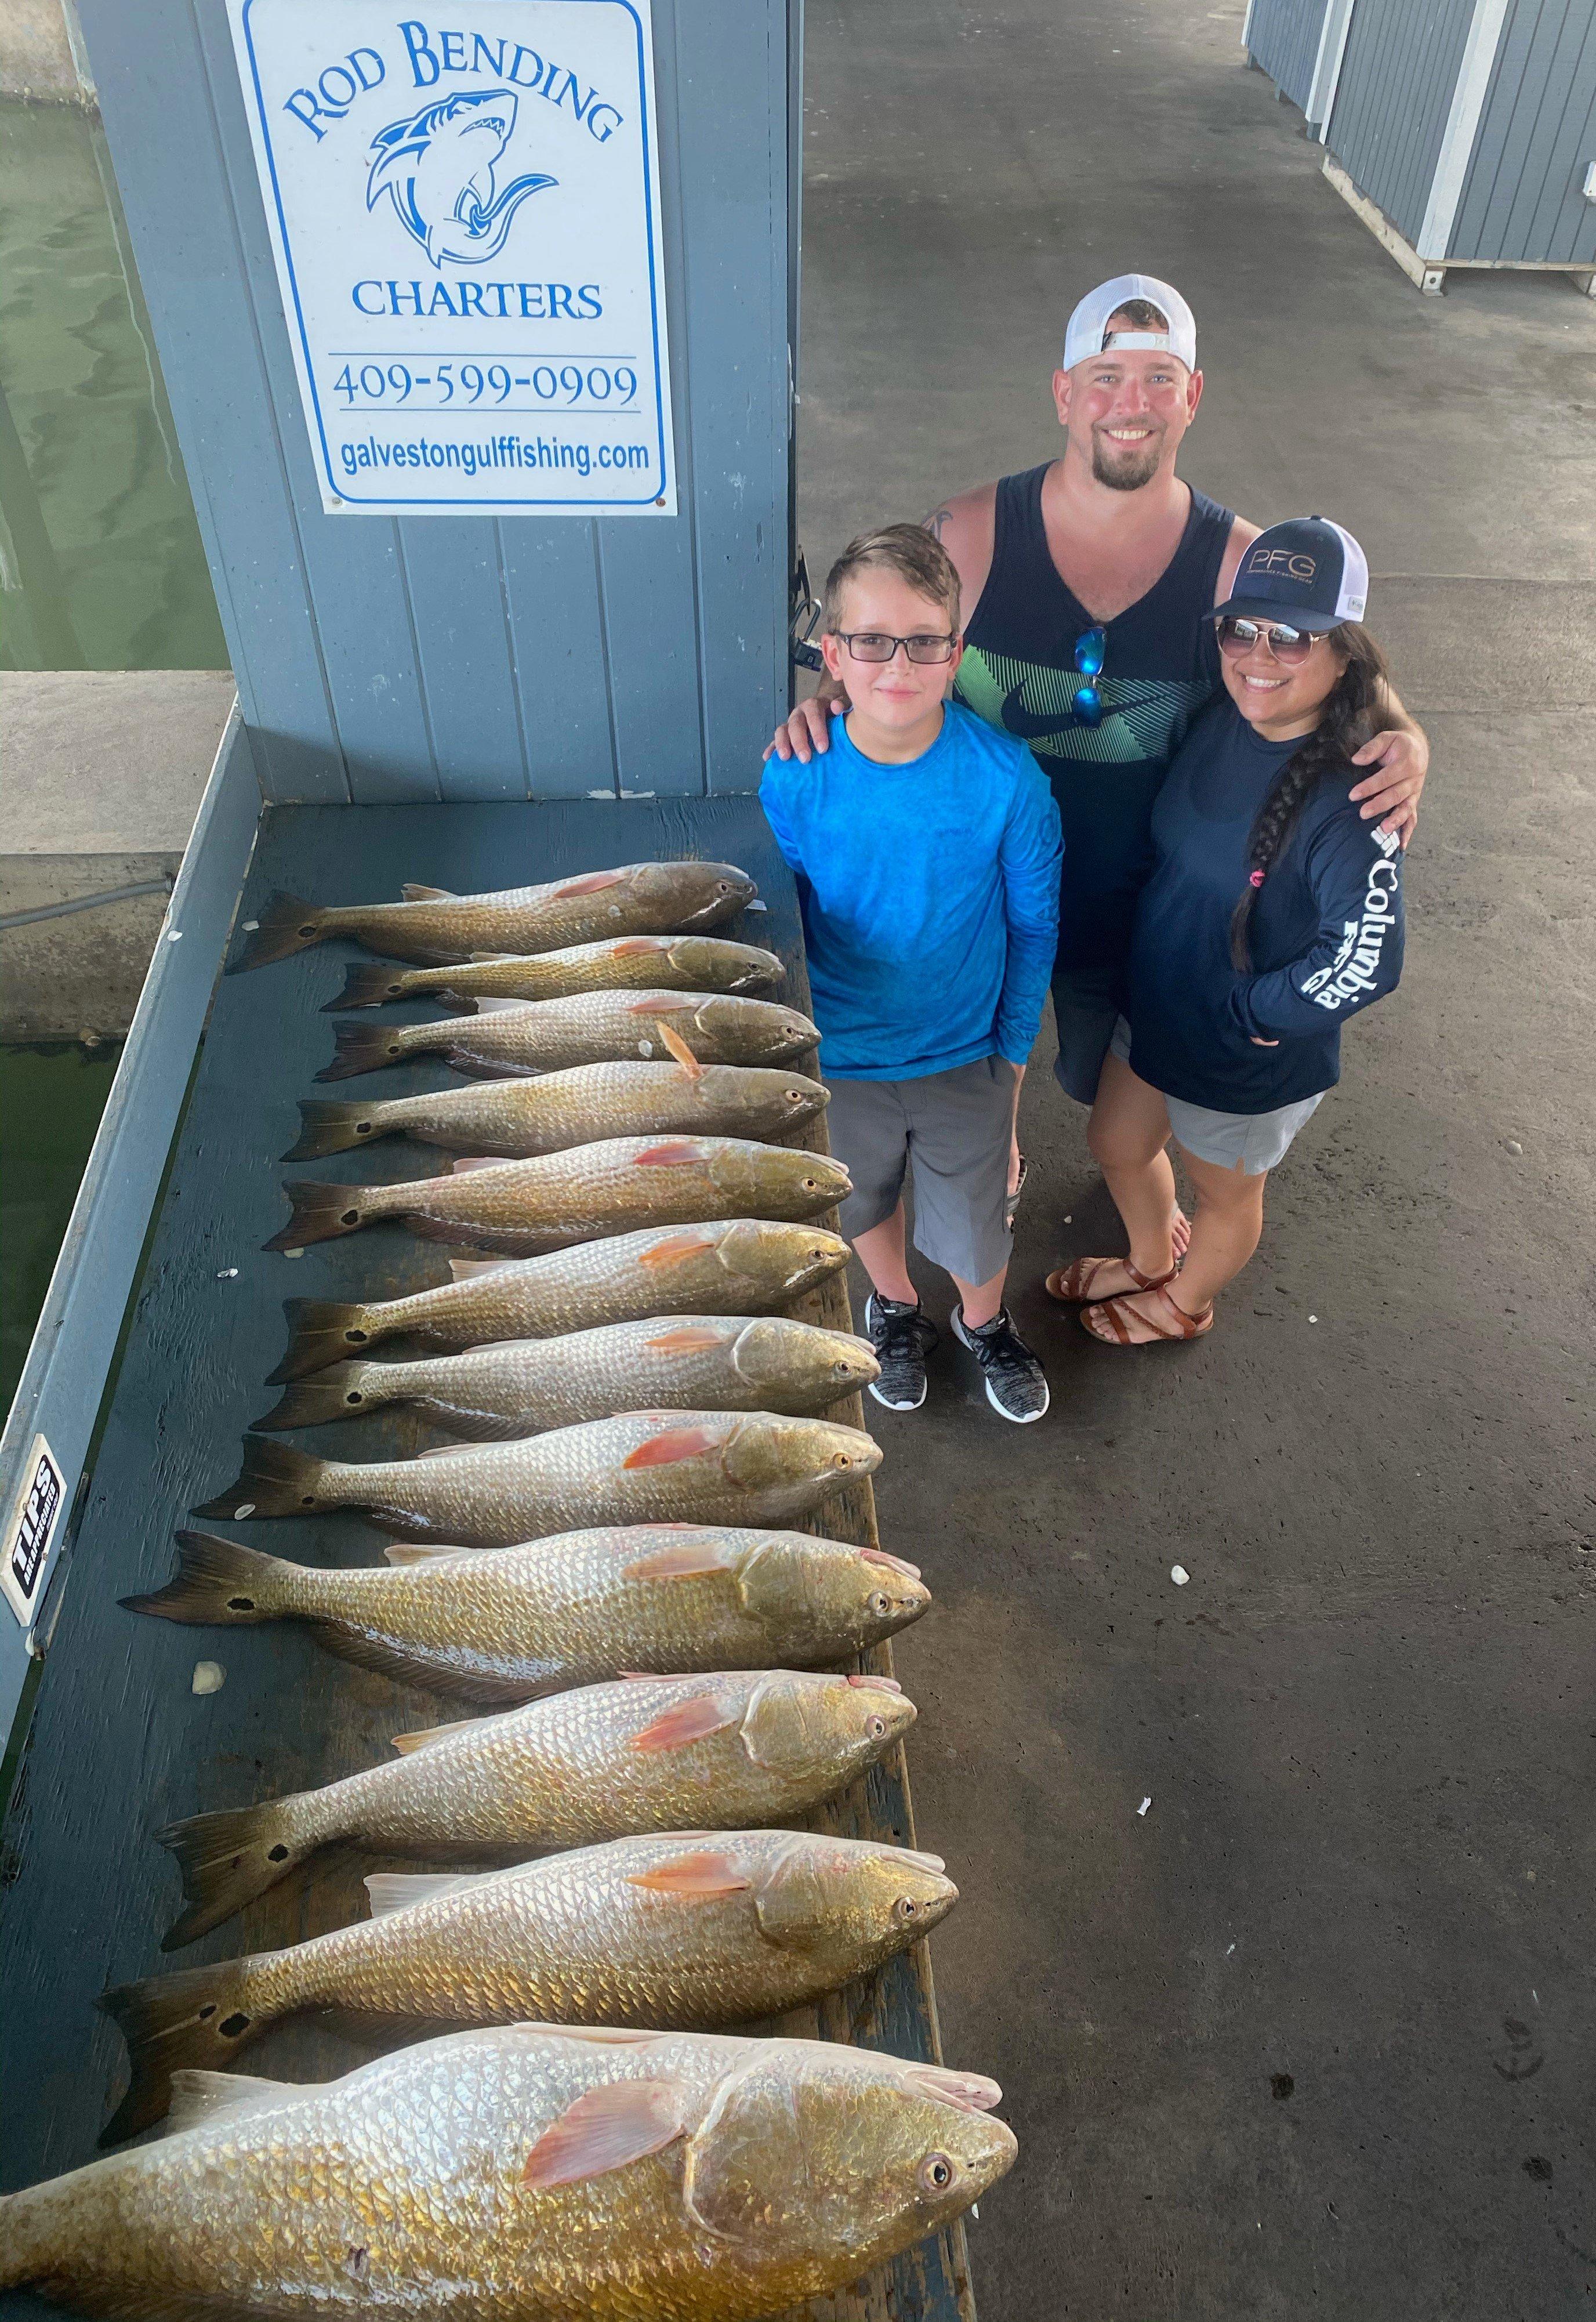 https://0201.nccdn.net/4_2/000/000/046/6ea/redfish-fishing-trip.jpeg